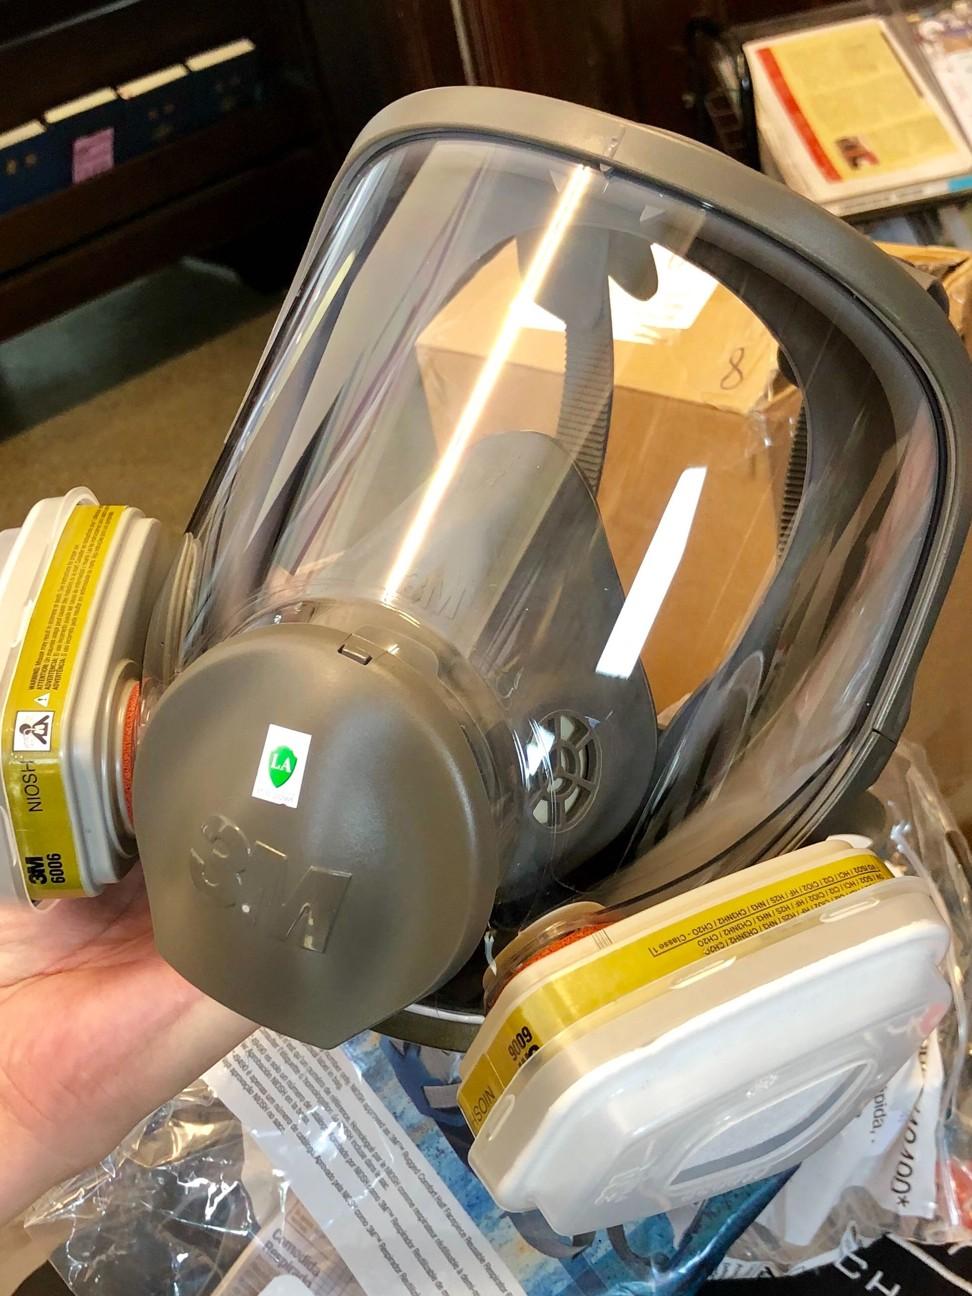 Gas mask sales soar in Taiwan as Hong Kong protesters seek fresh supplies